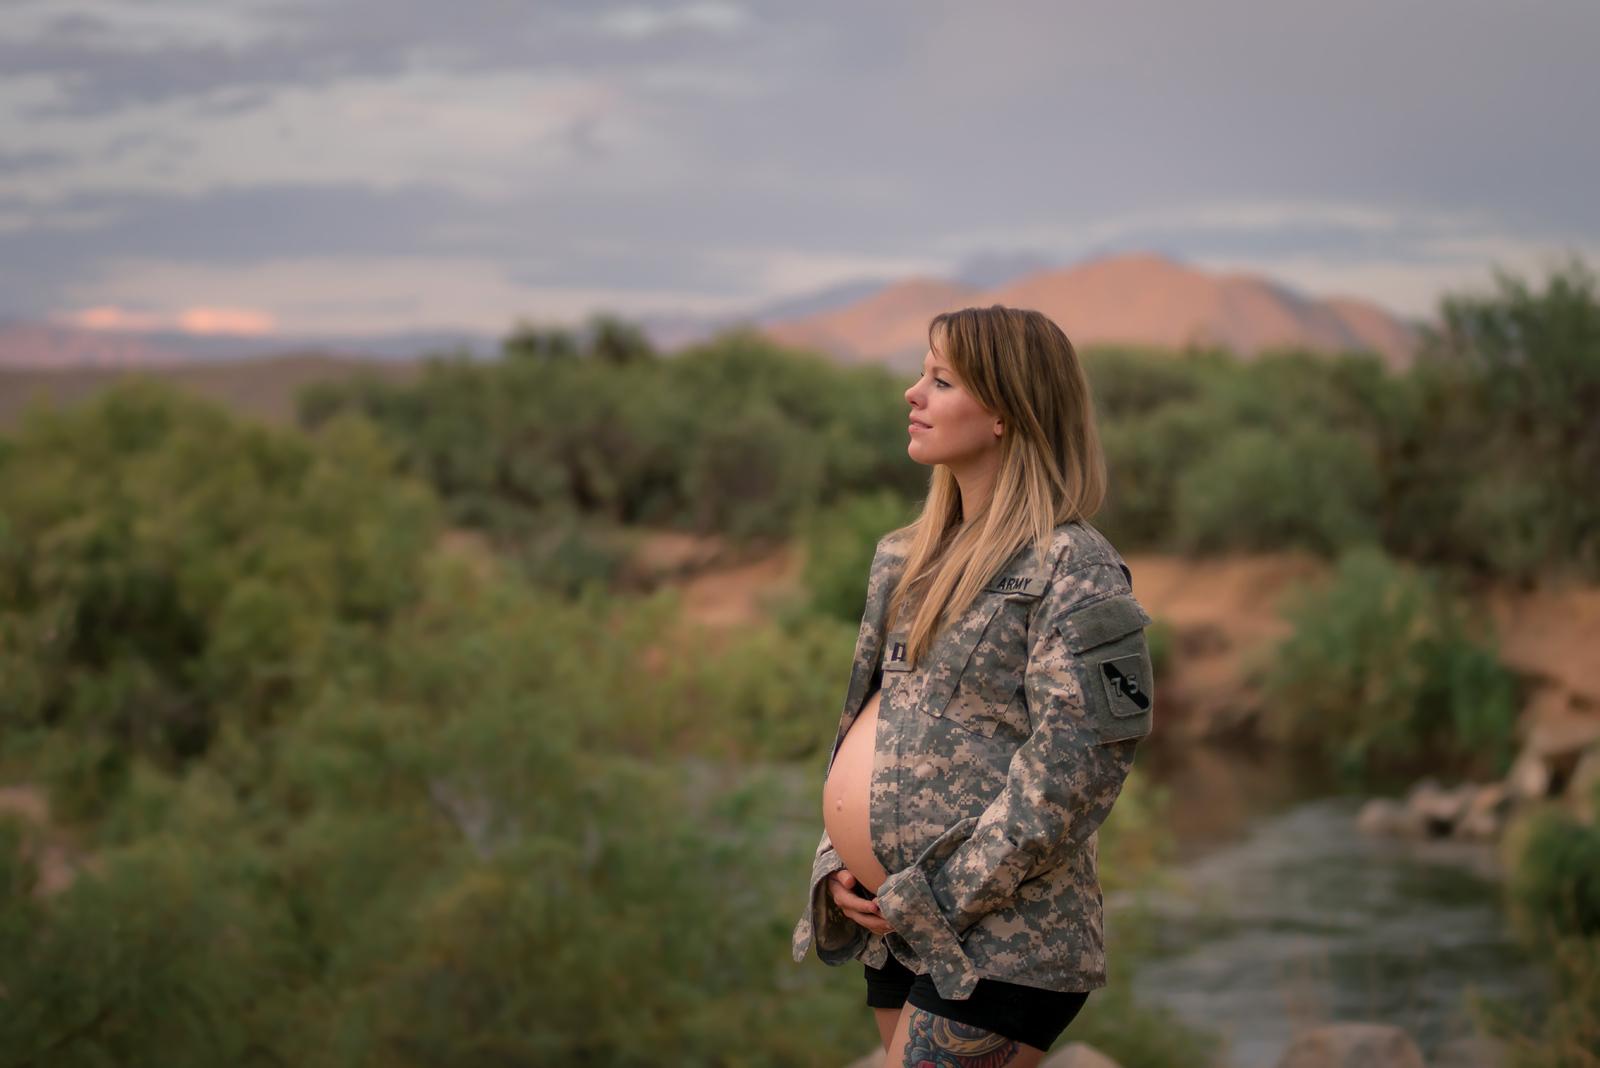 Sonday-Netzel Maternity Maternity Session | OhMGPhoto.com